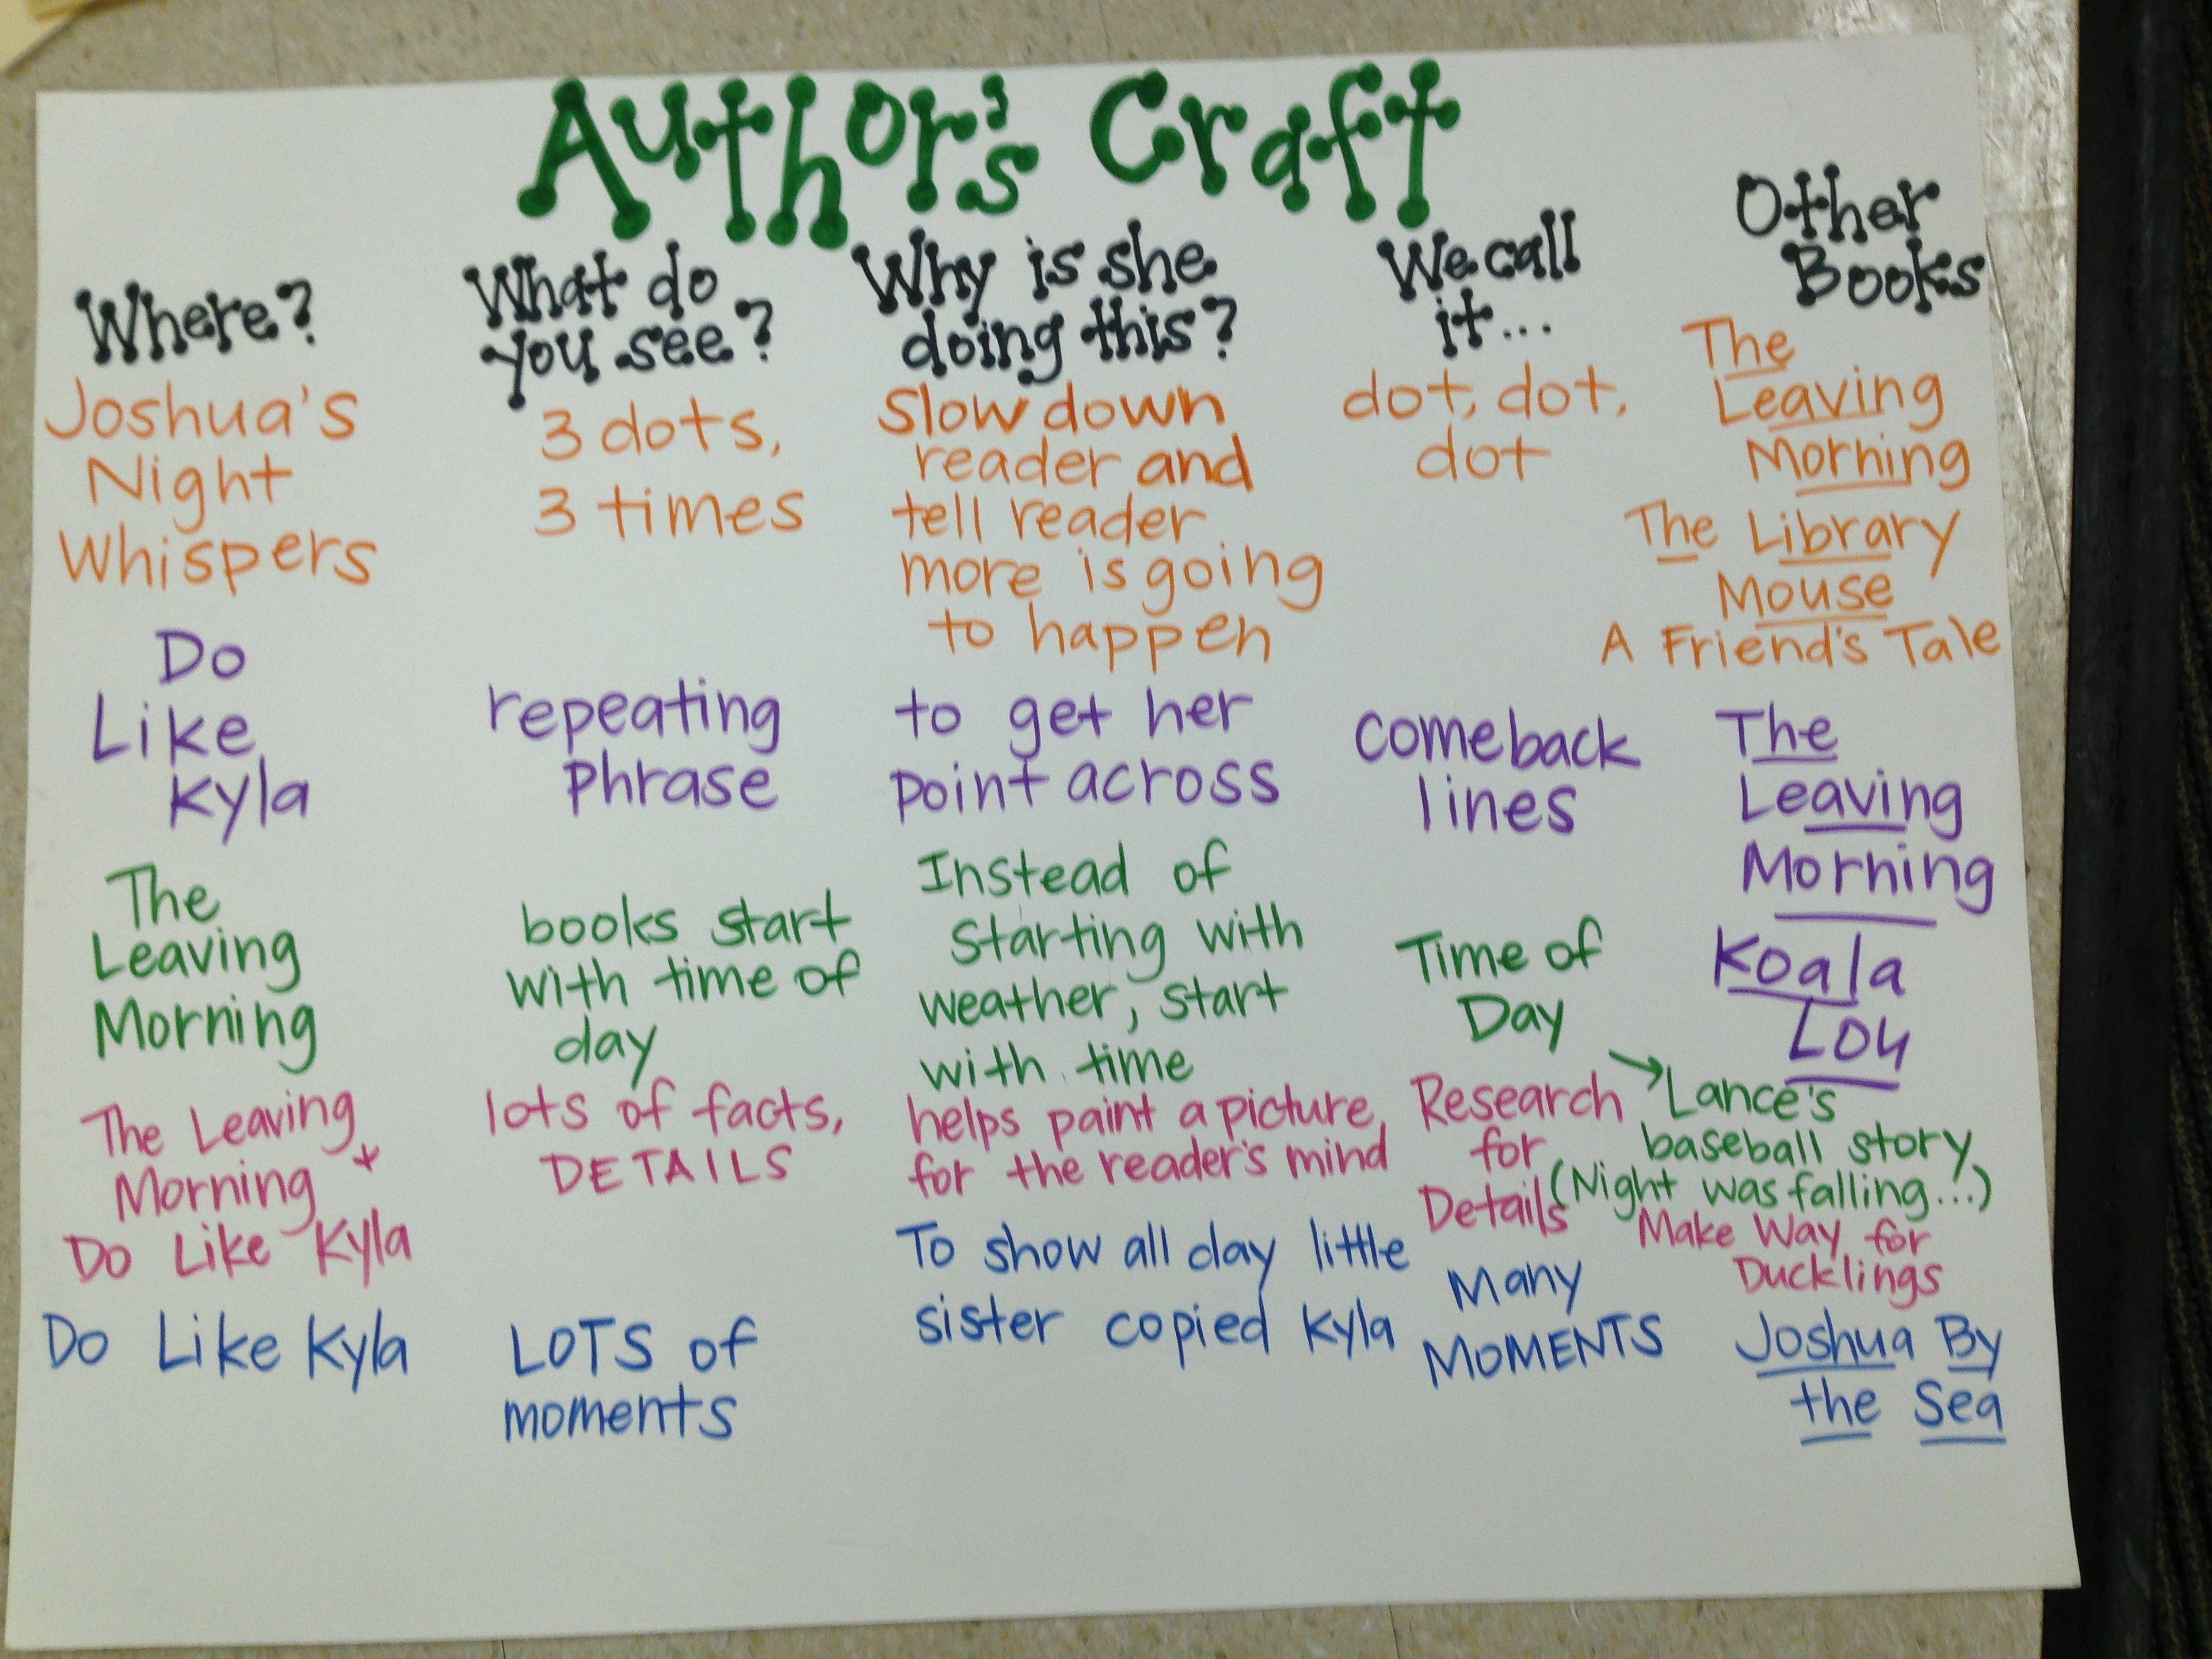 Author S Craft Angela Johnson